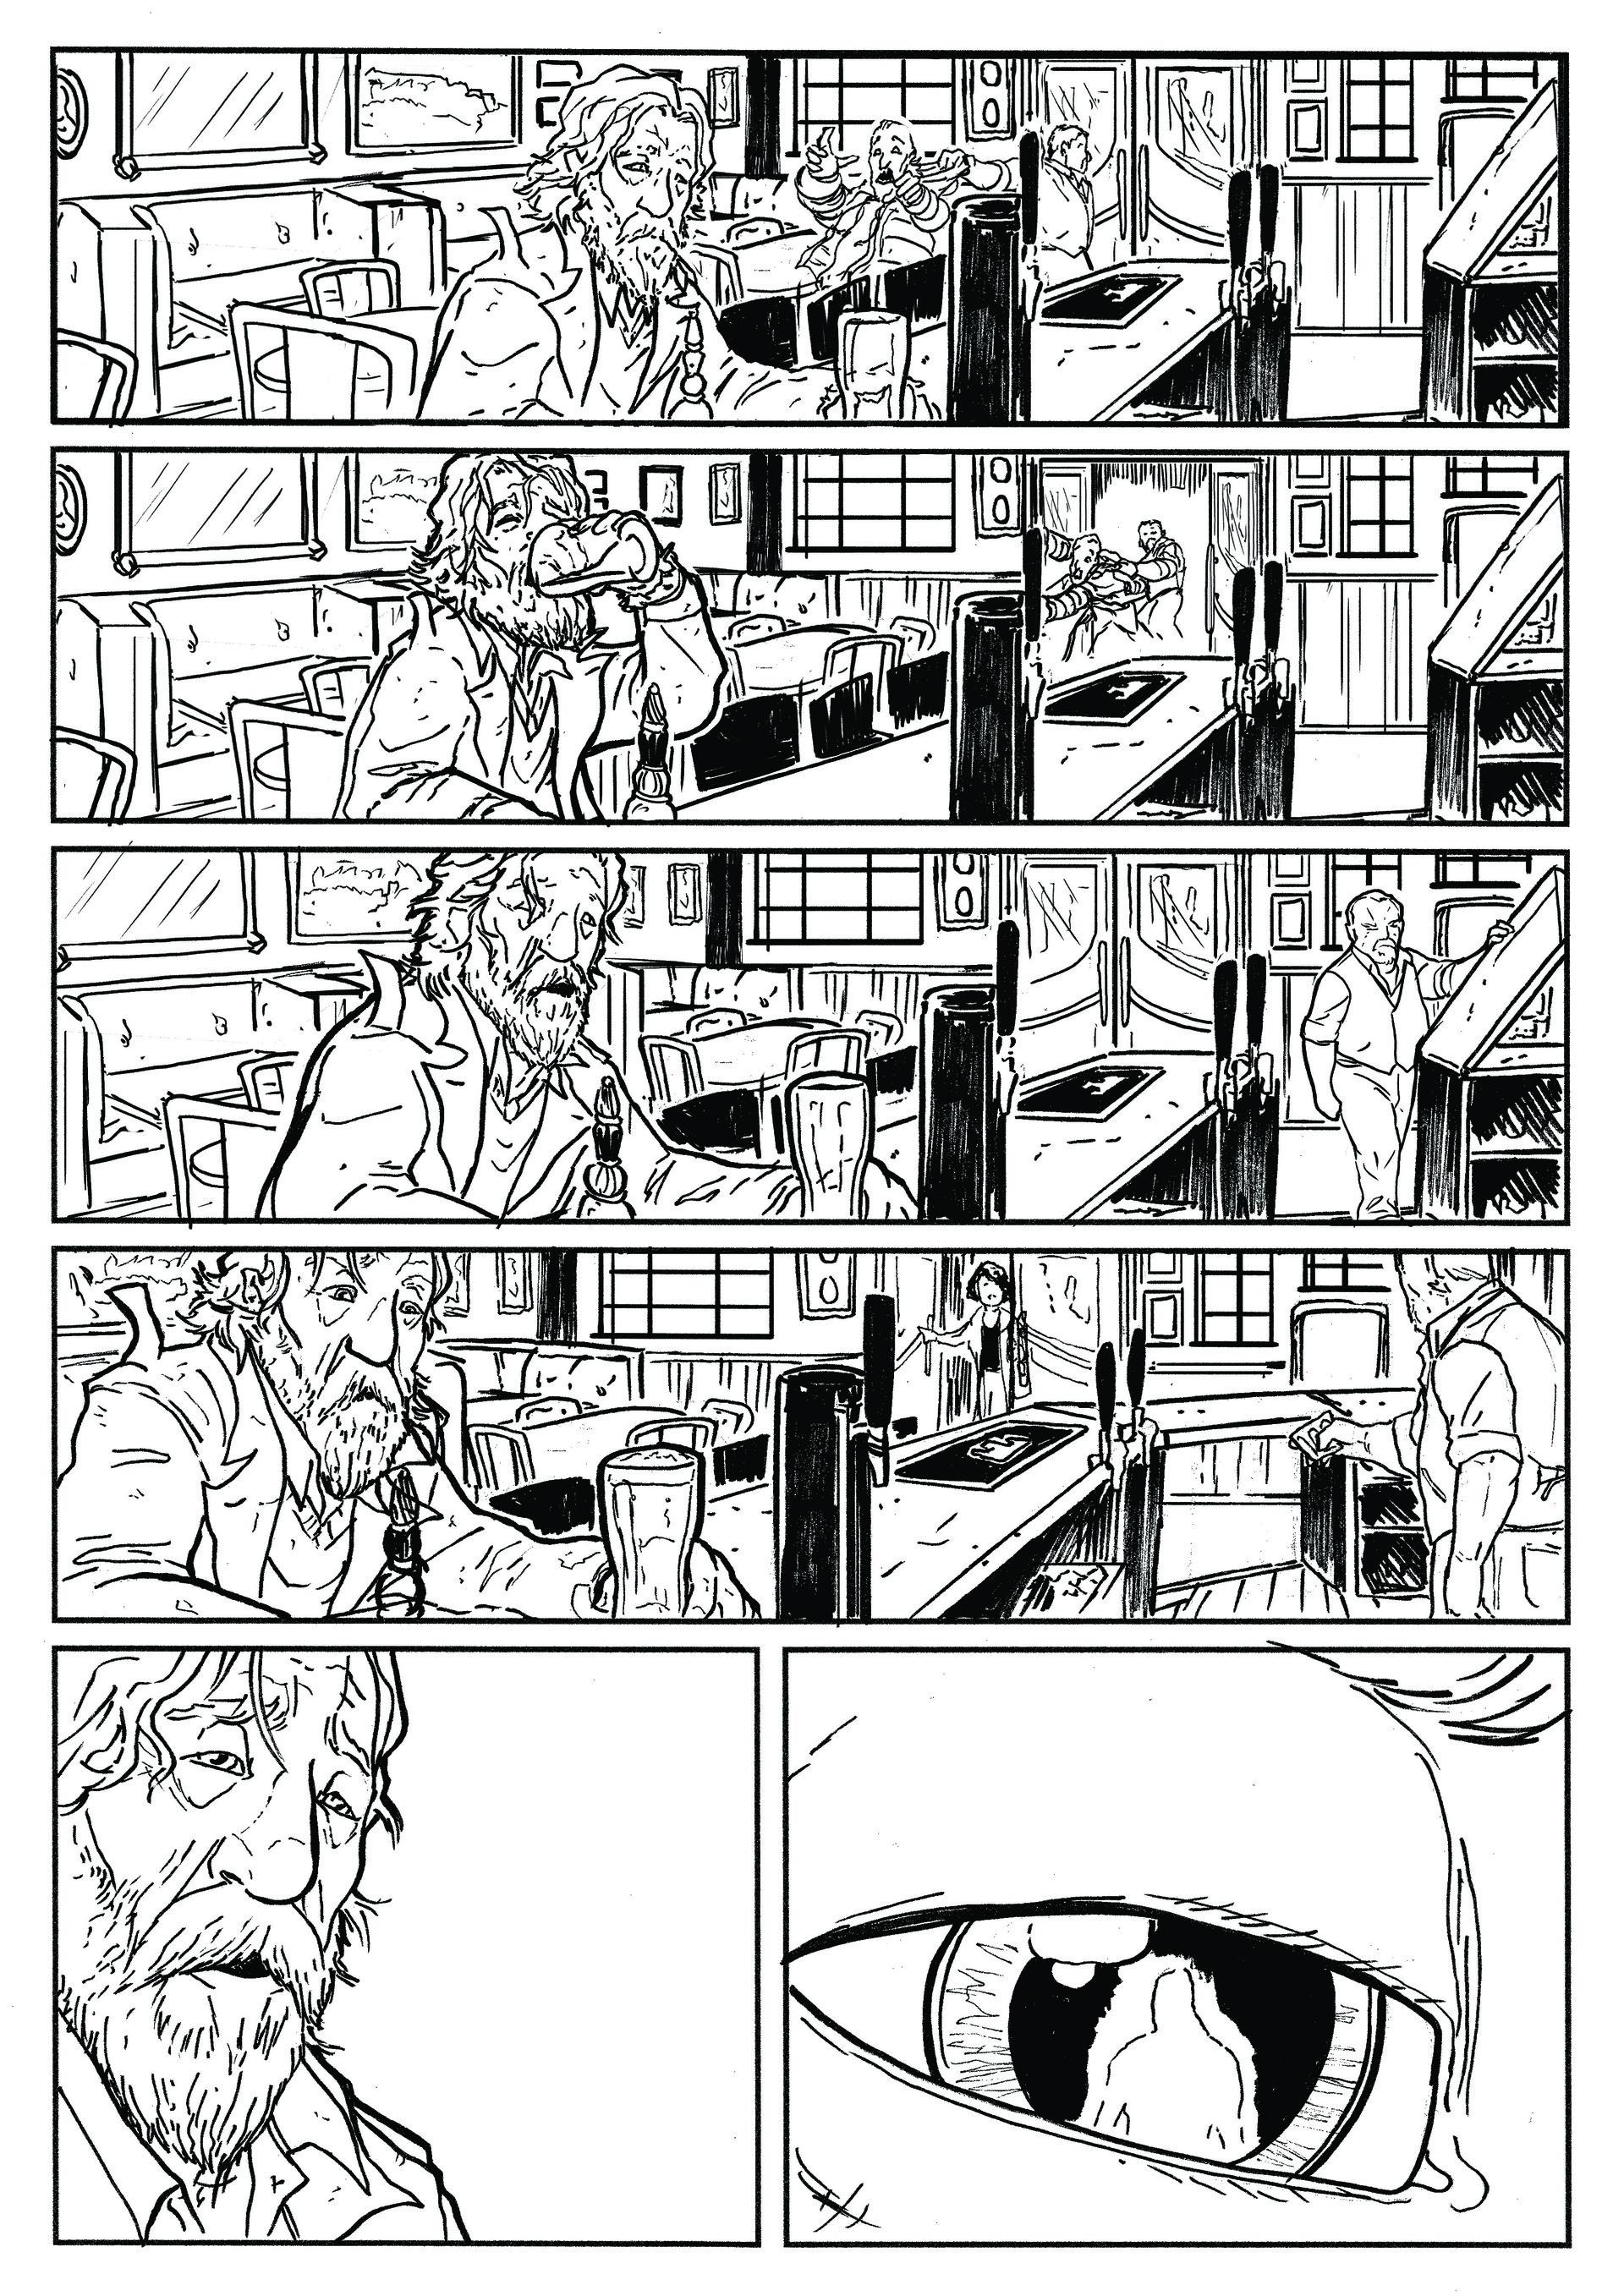 Elliot balson u page4 inks